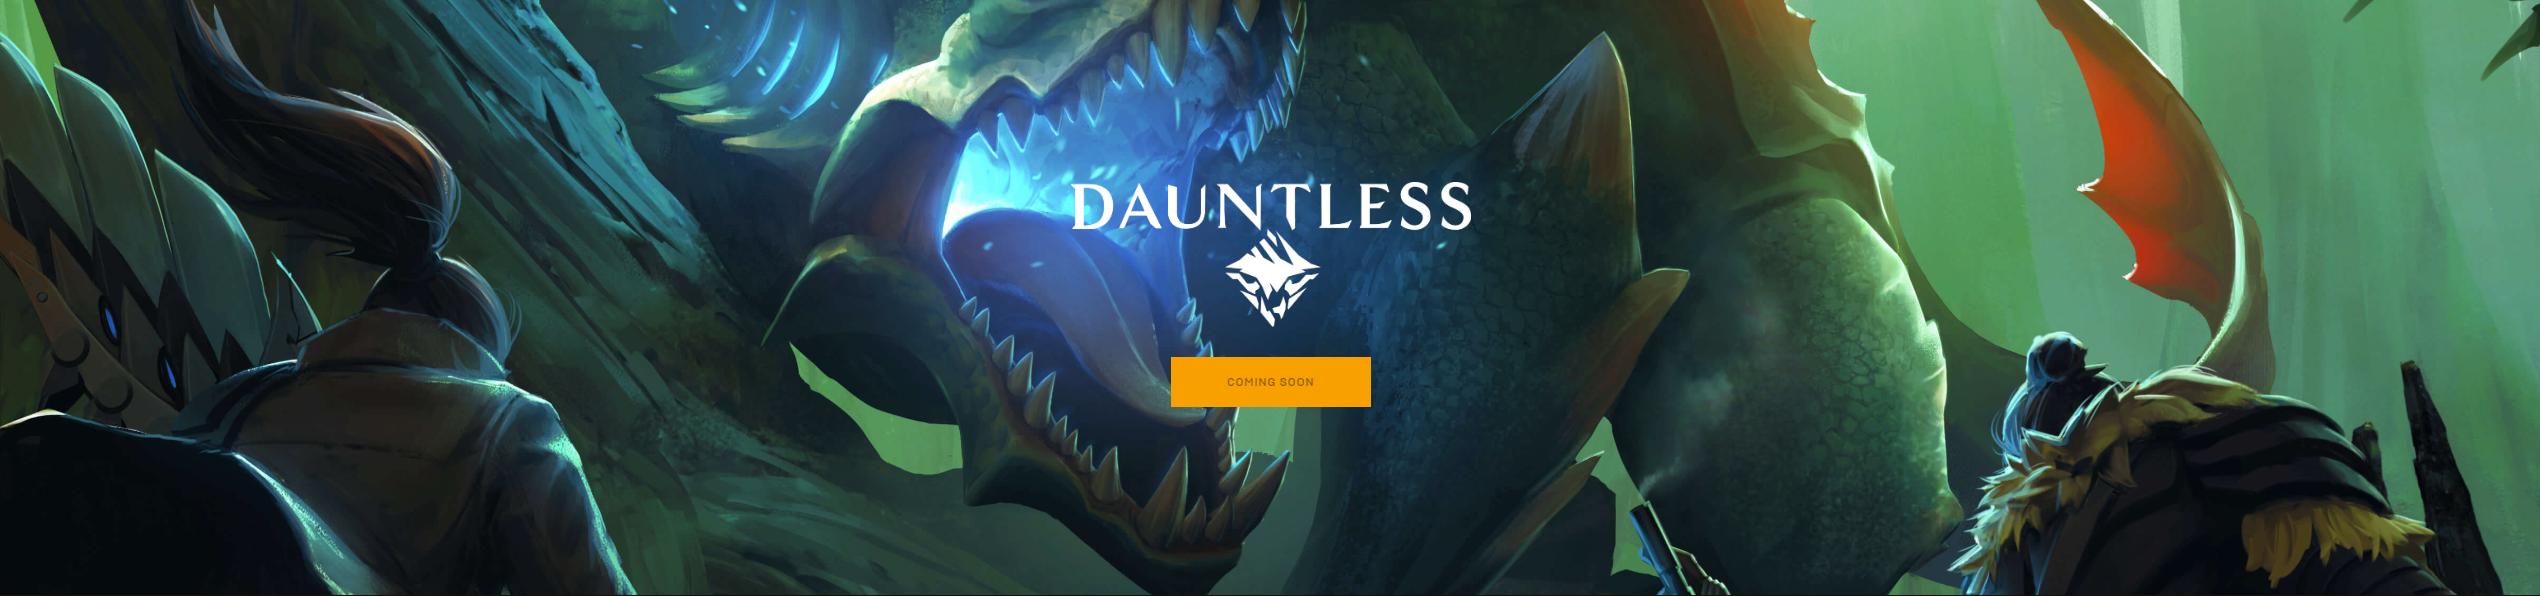 dauntless egs